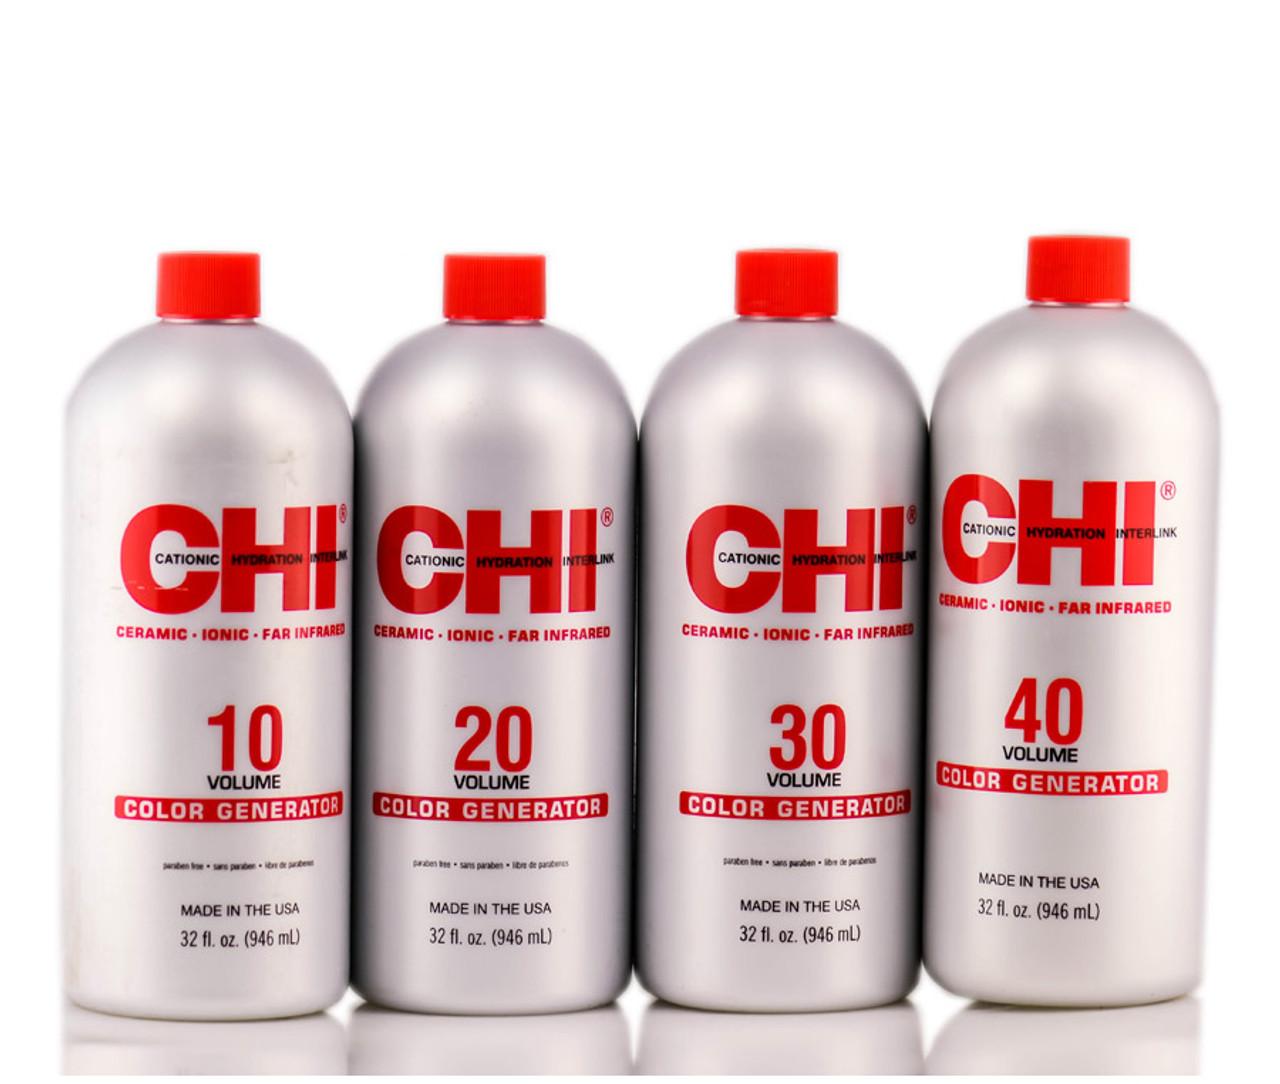 Chi Color Generator Sleekshop Formerly Sleekhair 10 Volume